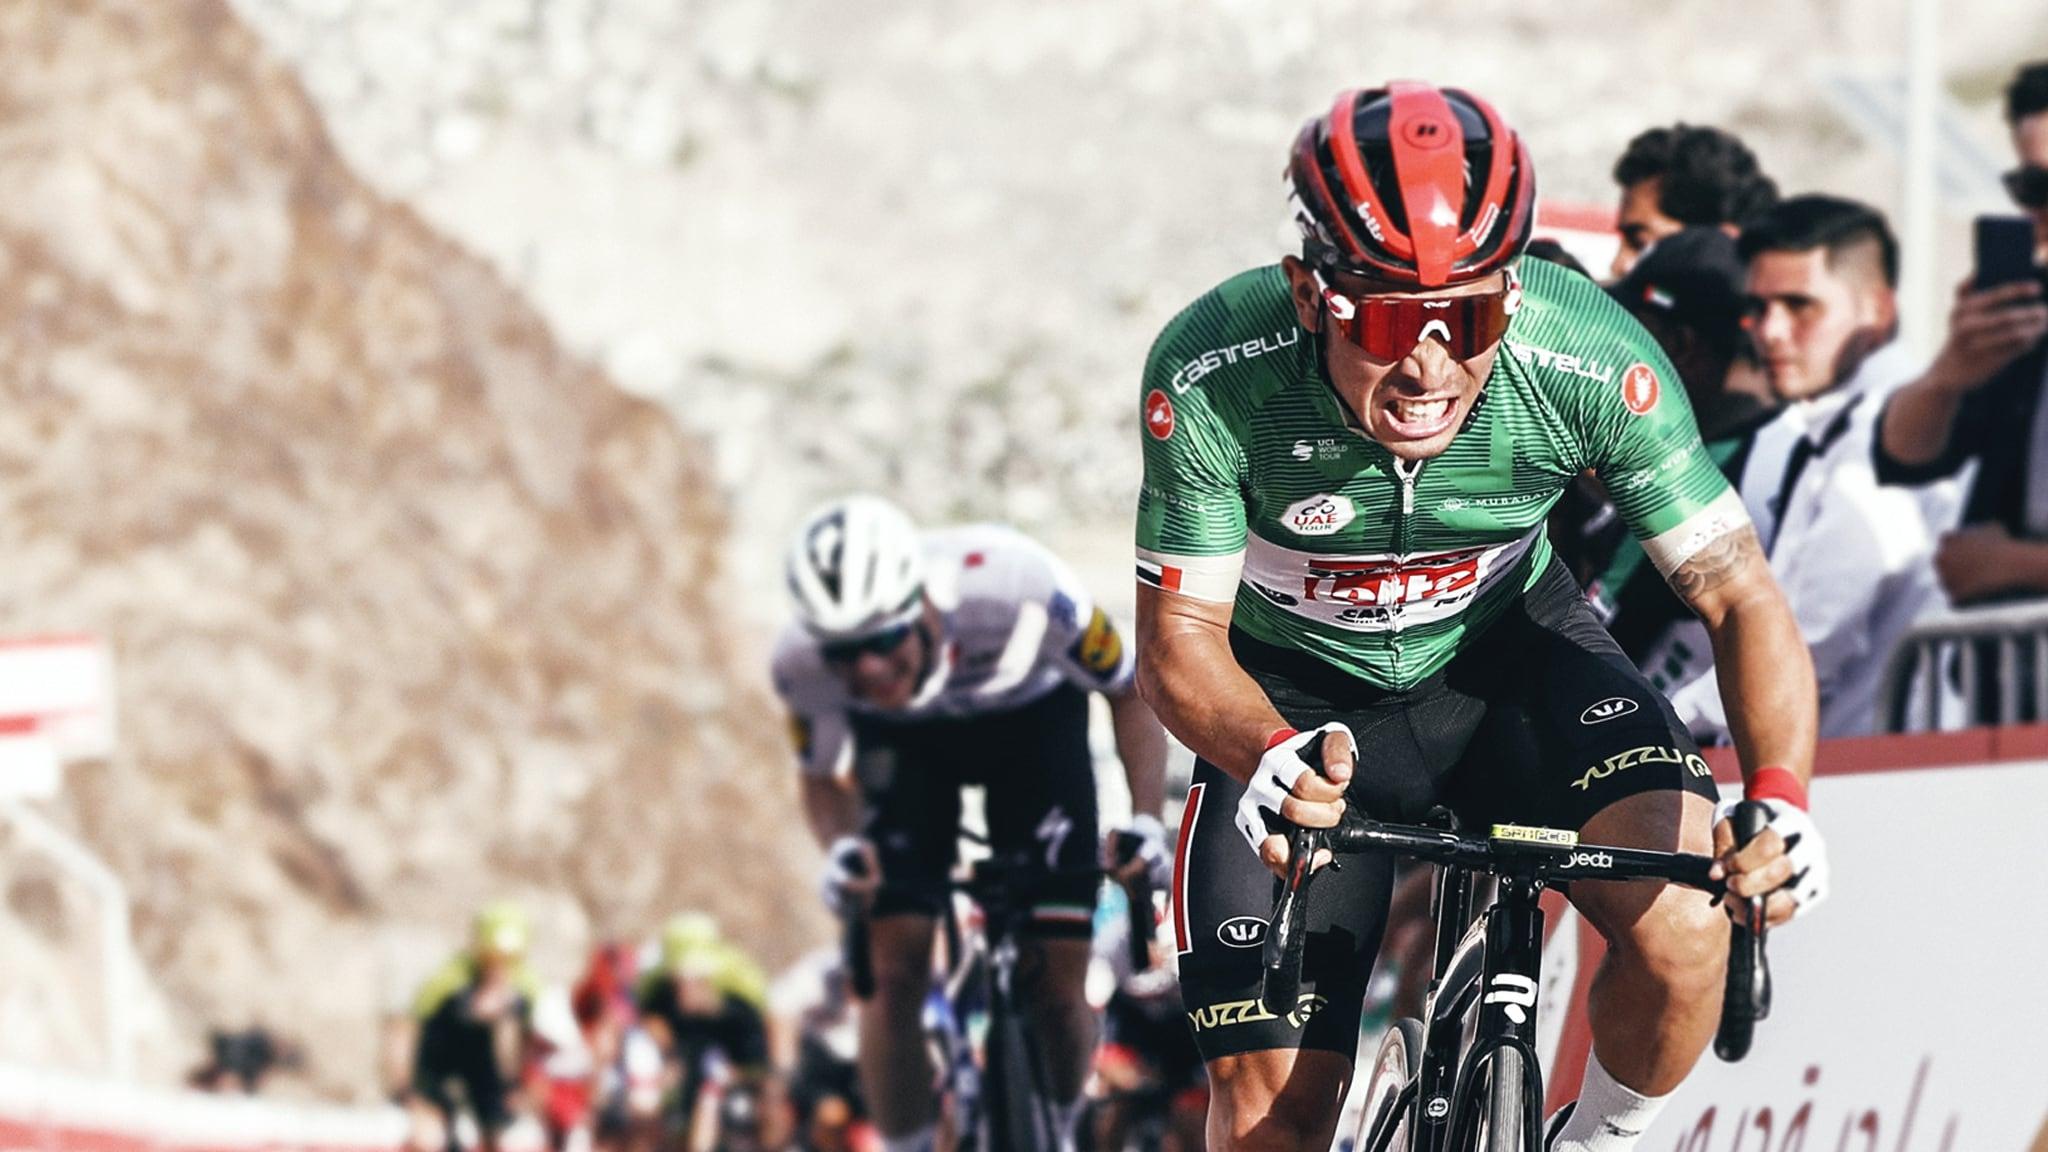 Rai Sport+ HD Ciclismo: Tour degli Emirati Arabi Uniti - 3a tappa